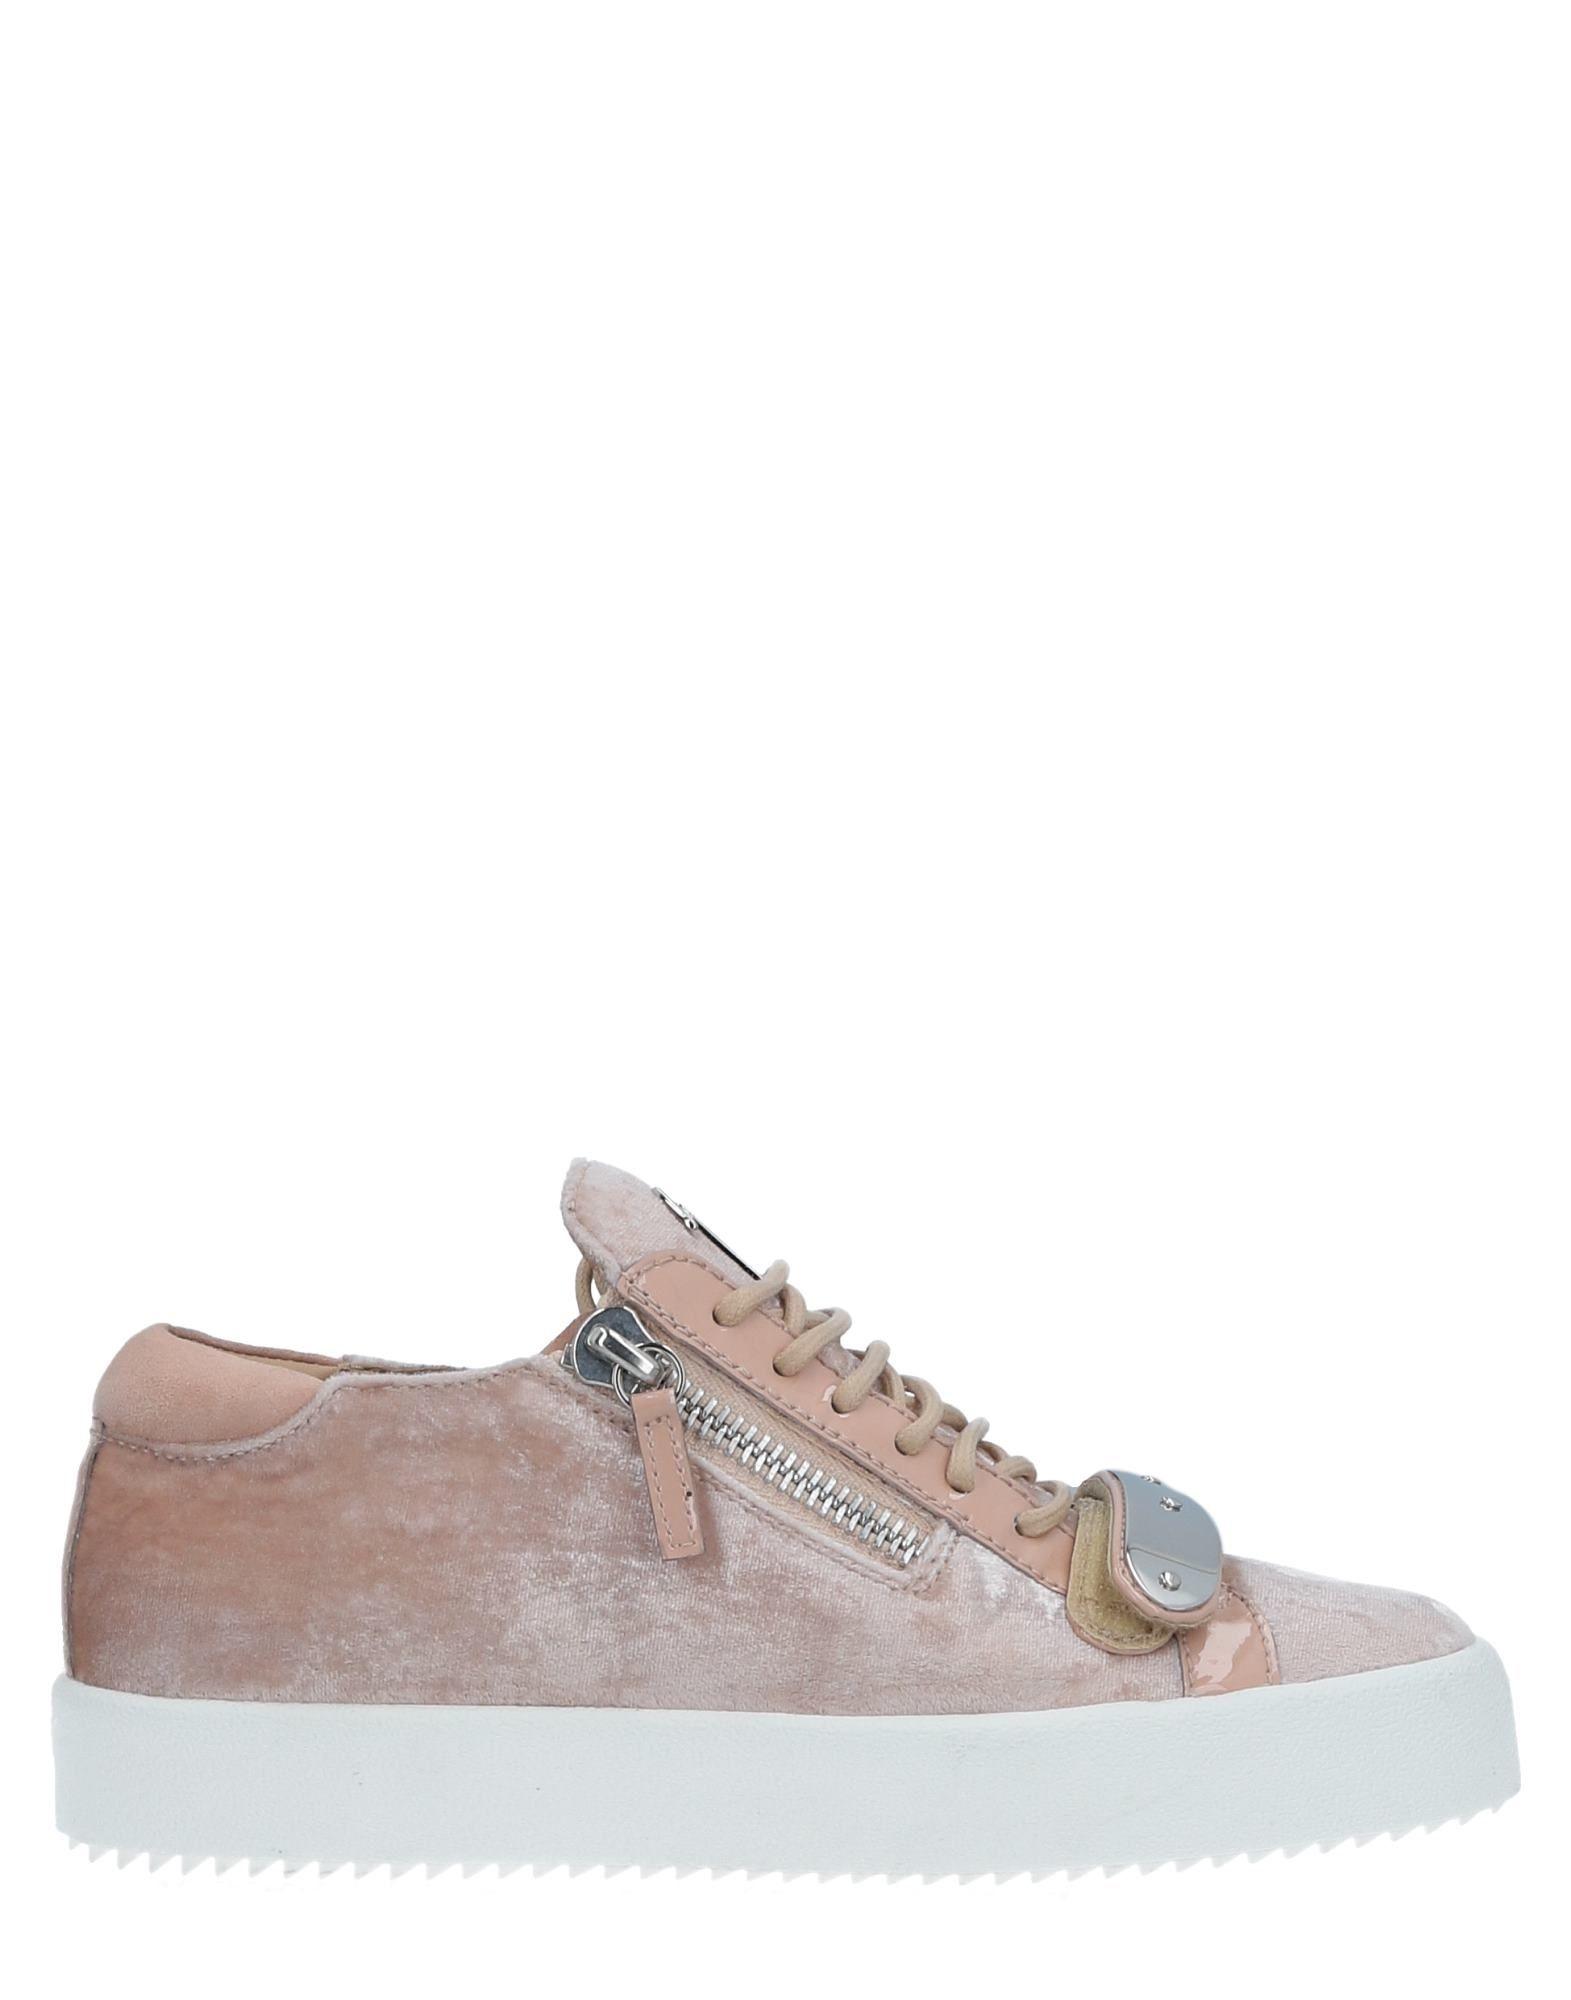 Giuseppe Zanotti Sneakers Damen  11515575HPGünstige gut aussehende Schuhe